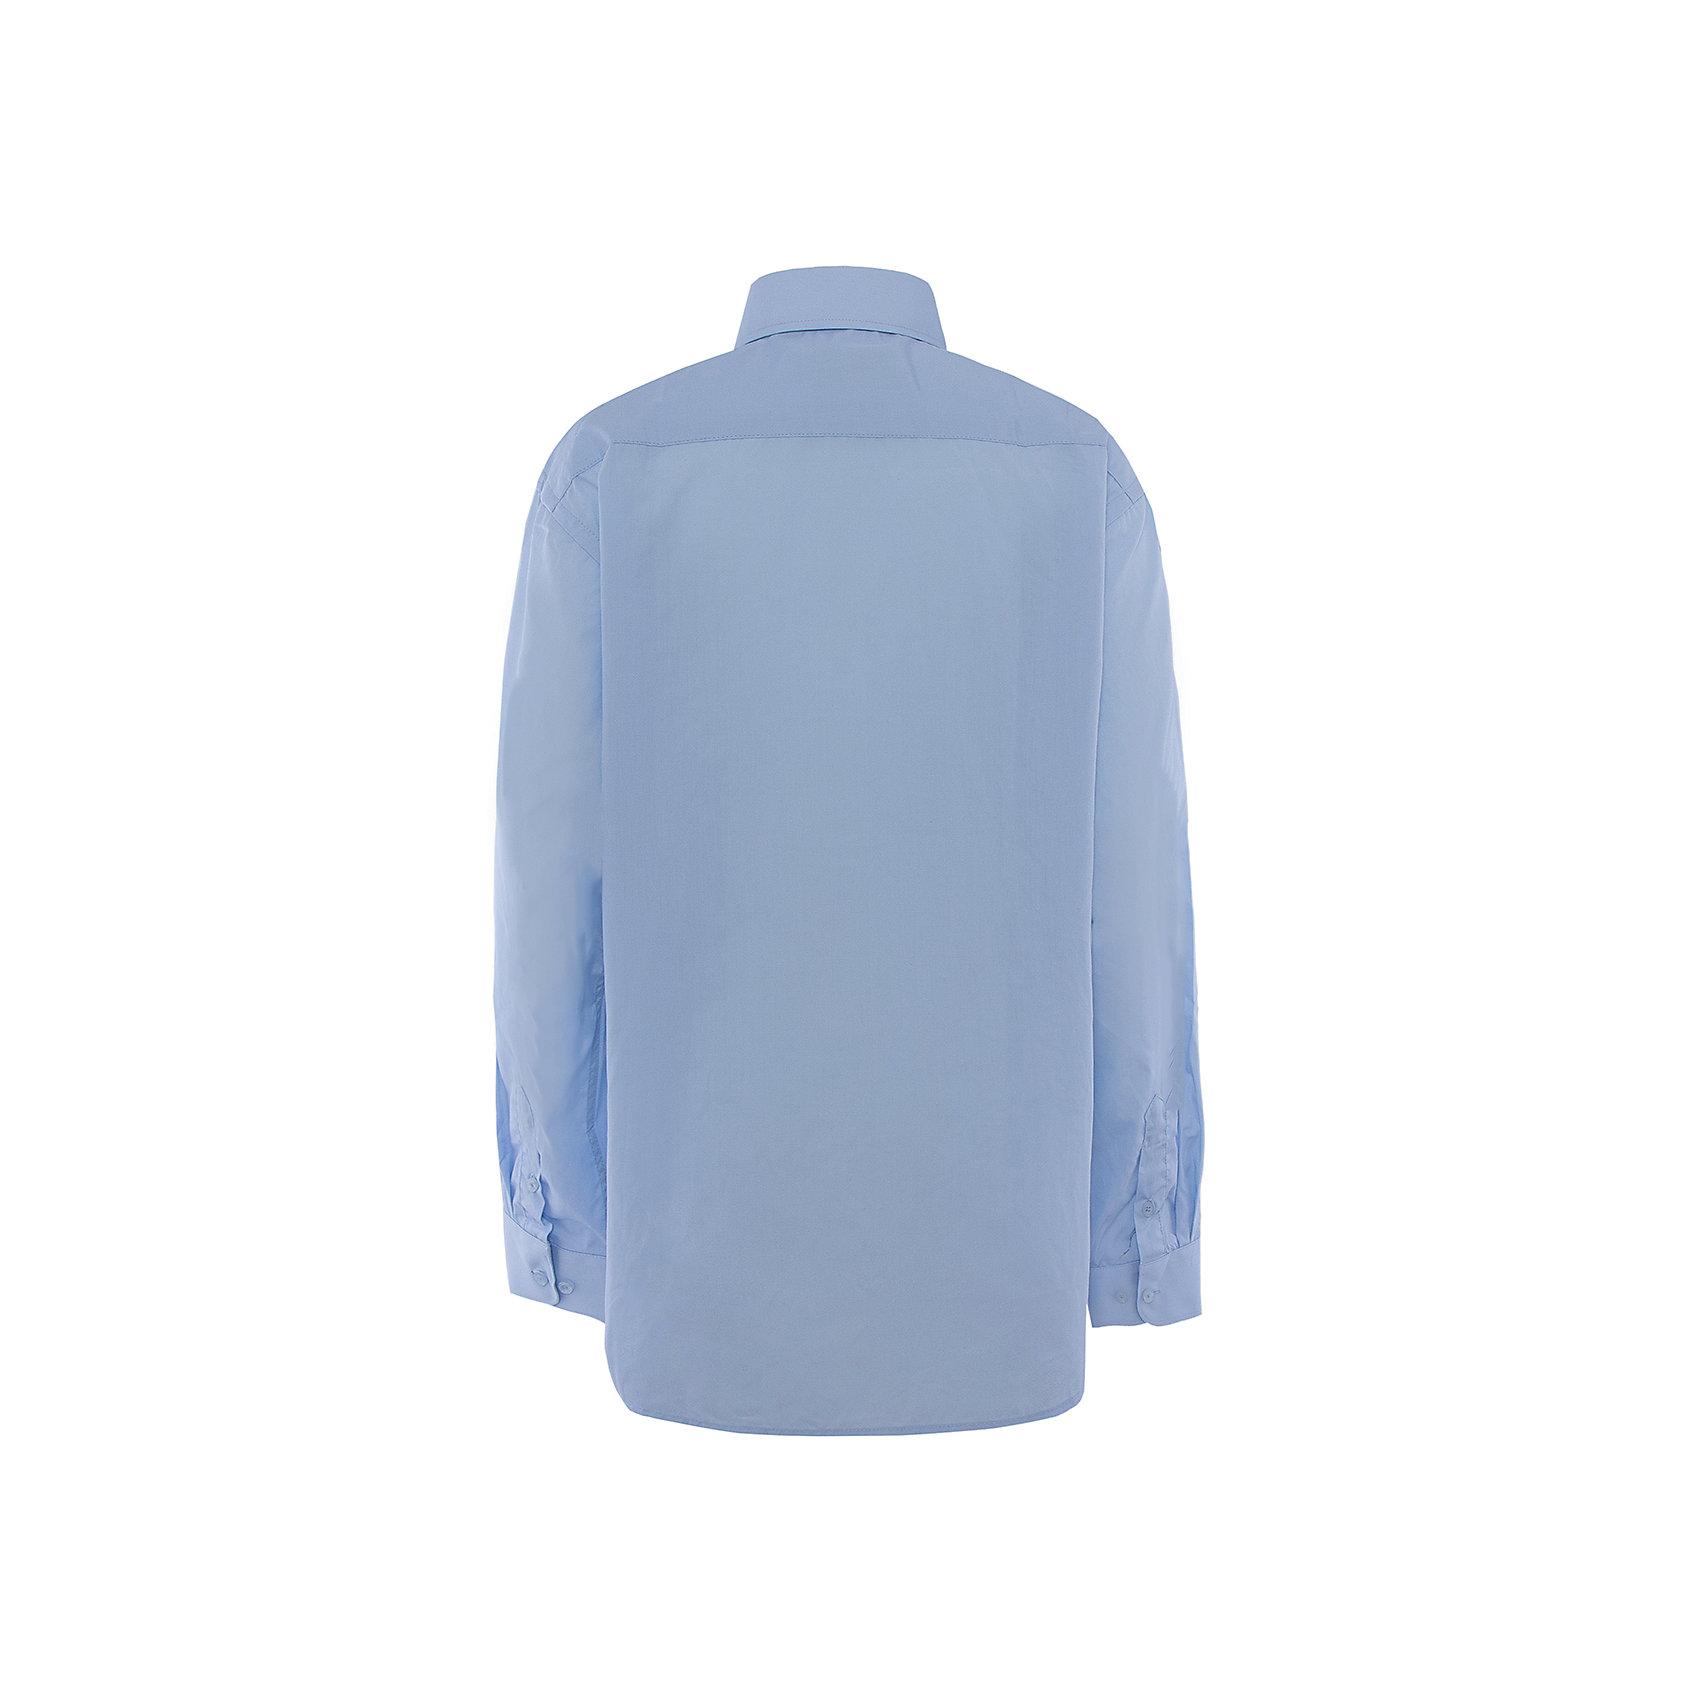 Рубашка для мальчика Skylake от myToys